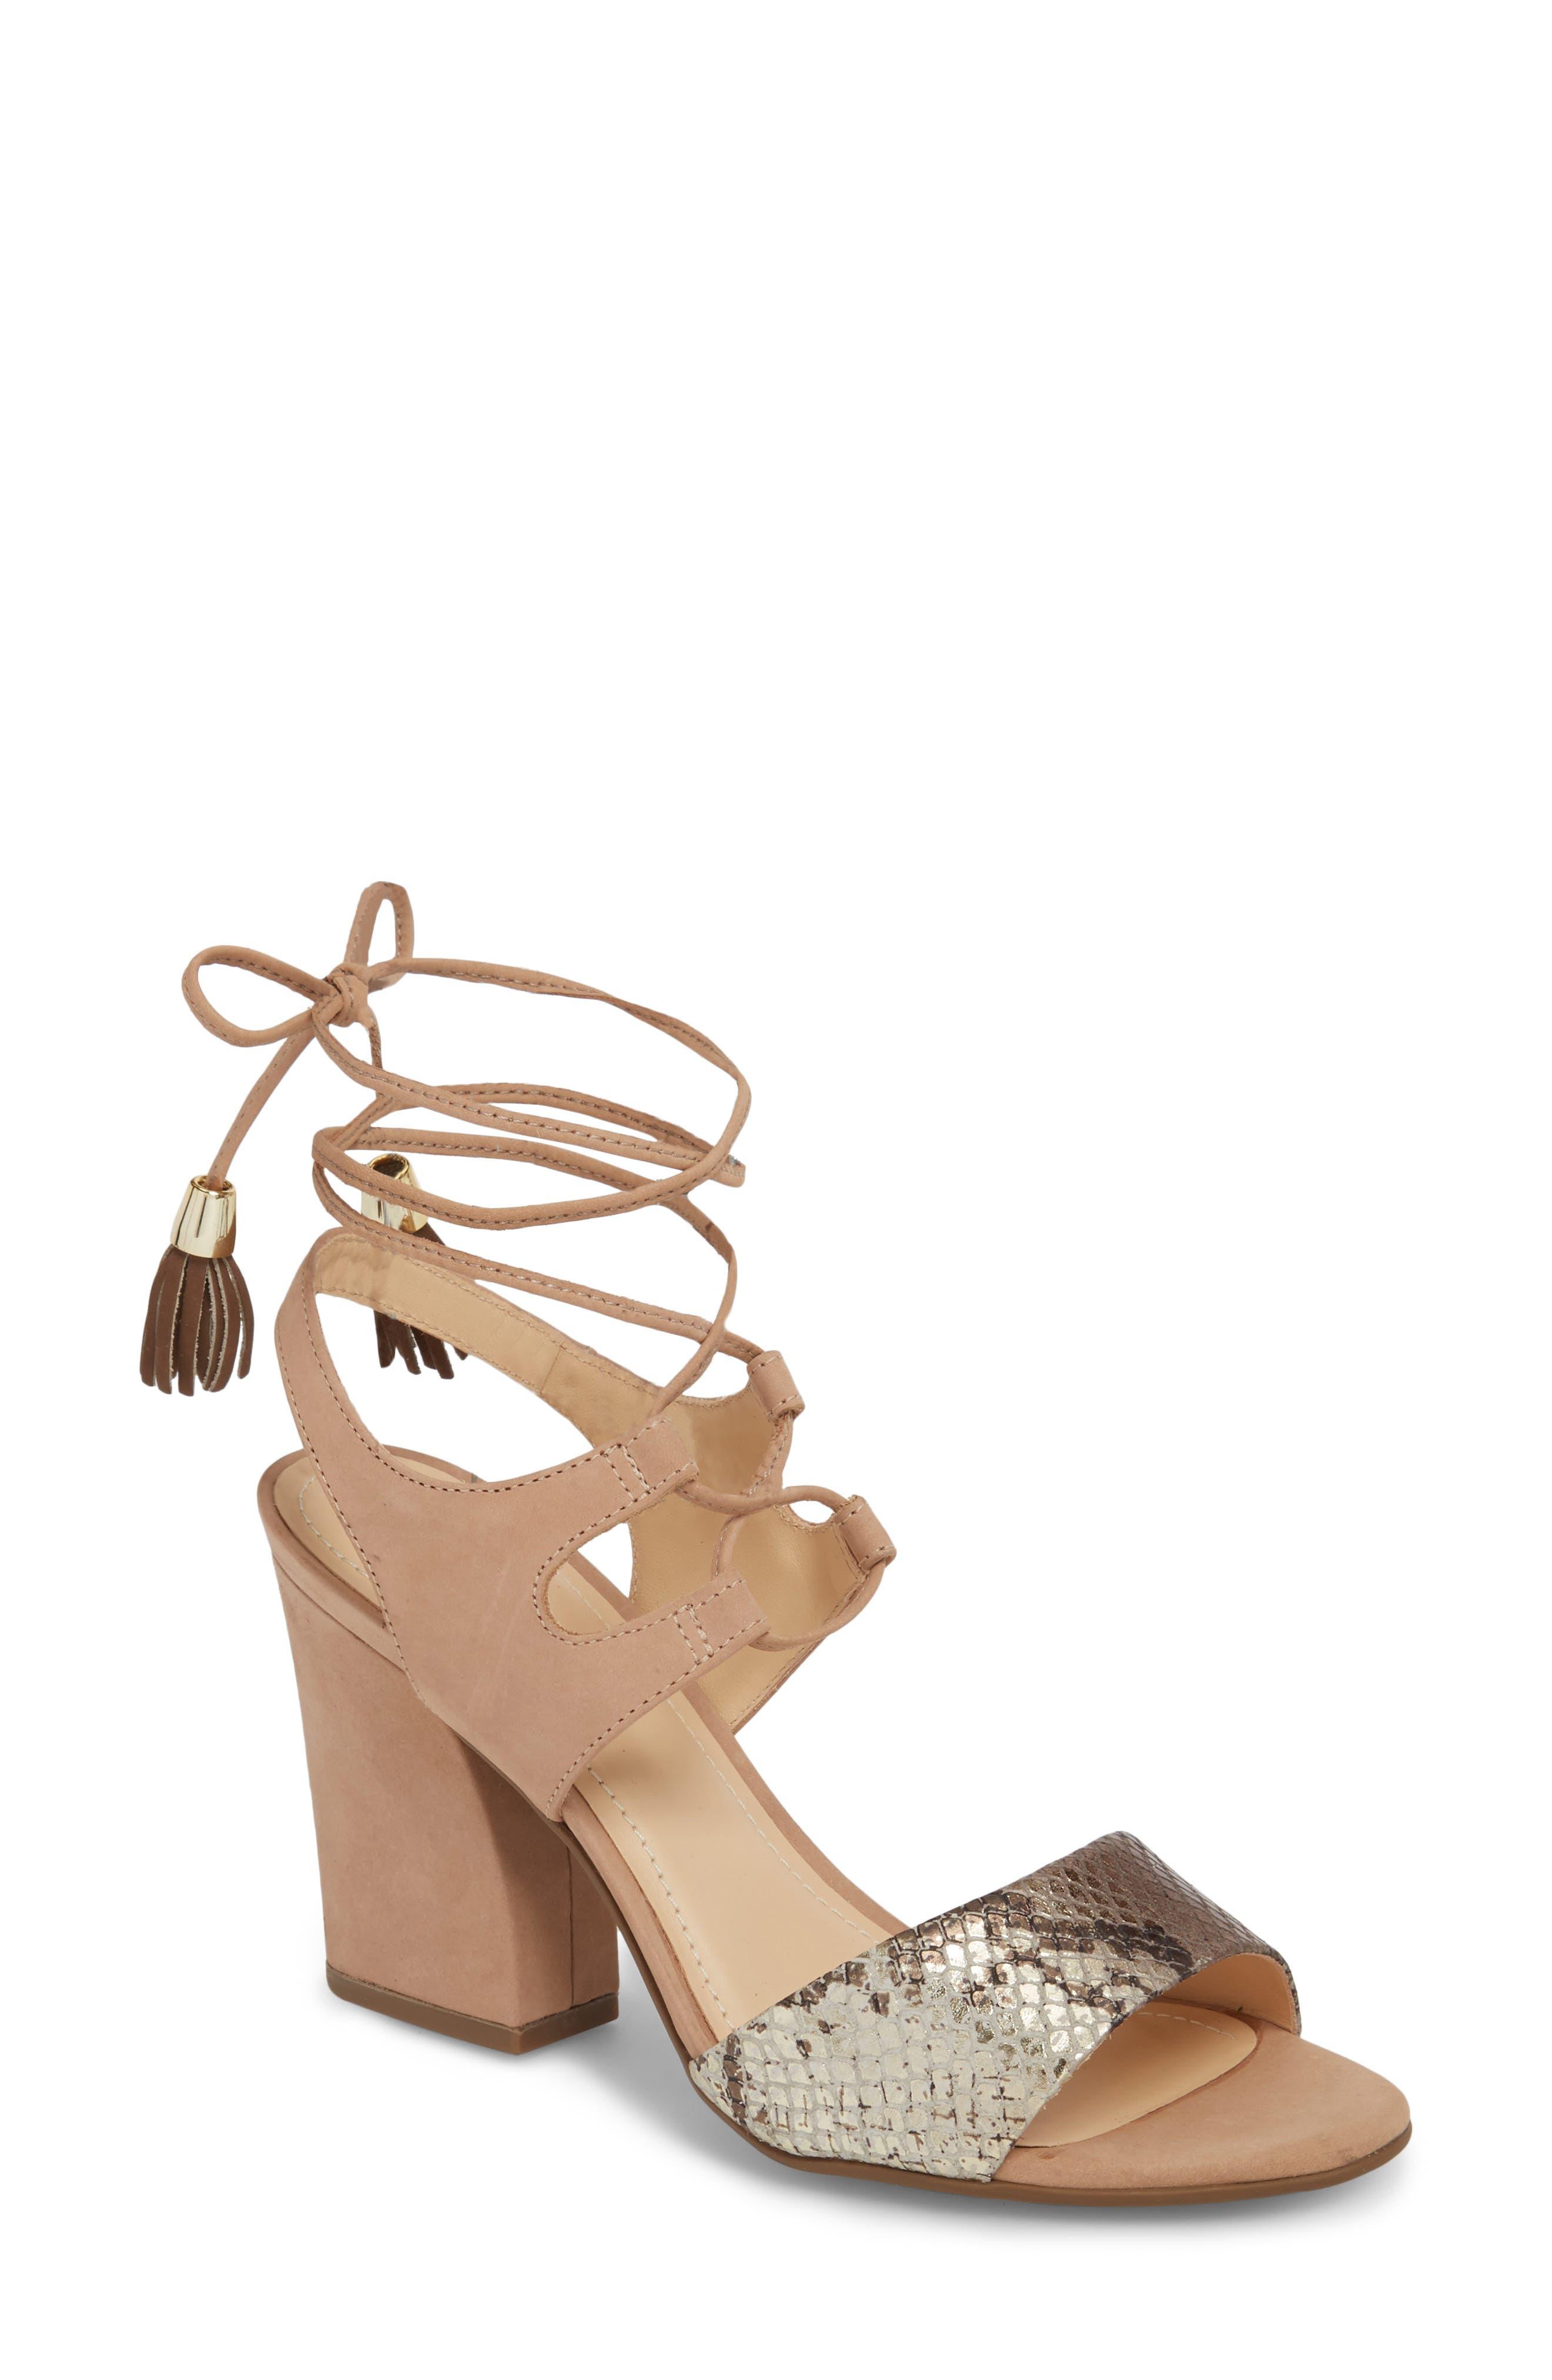 Kaira Ankle Wrap Sandal,                         Main,                         color, SNAKE PRINT LEATHER